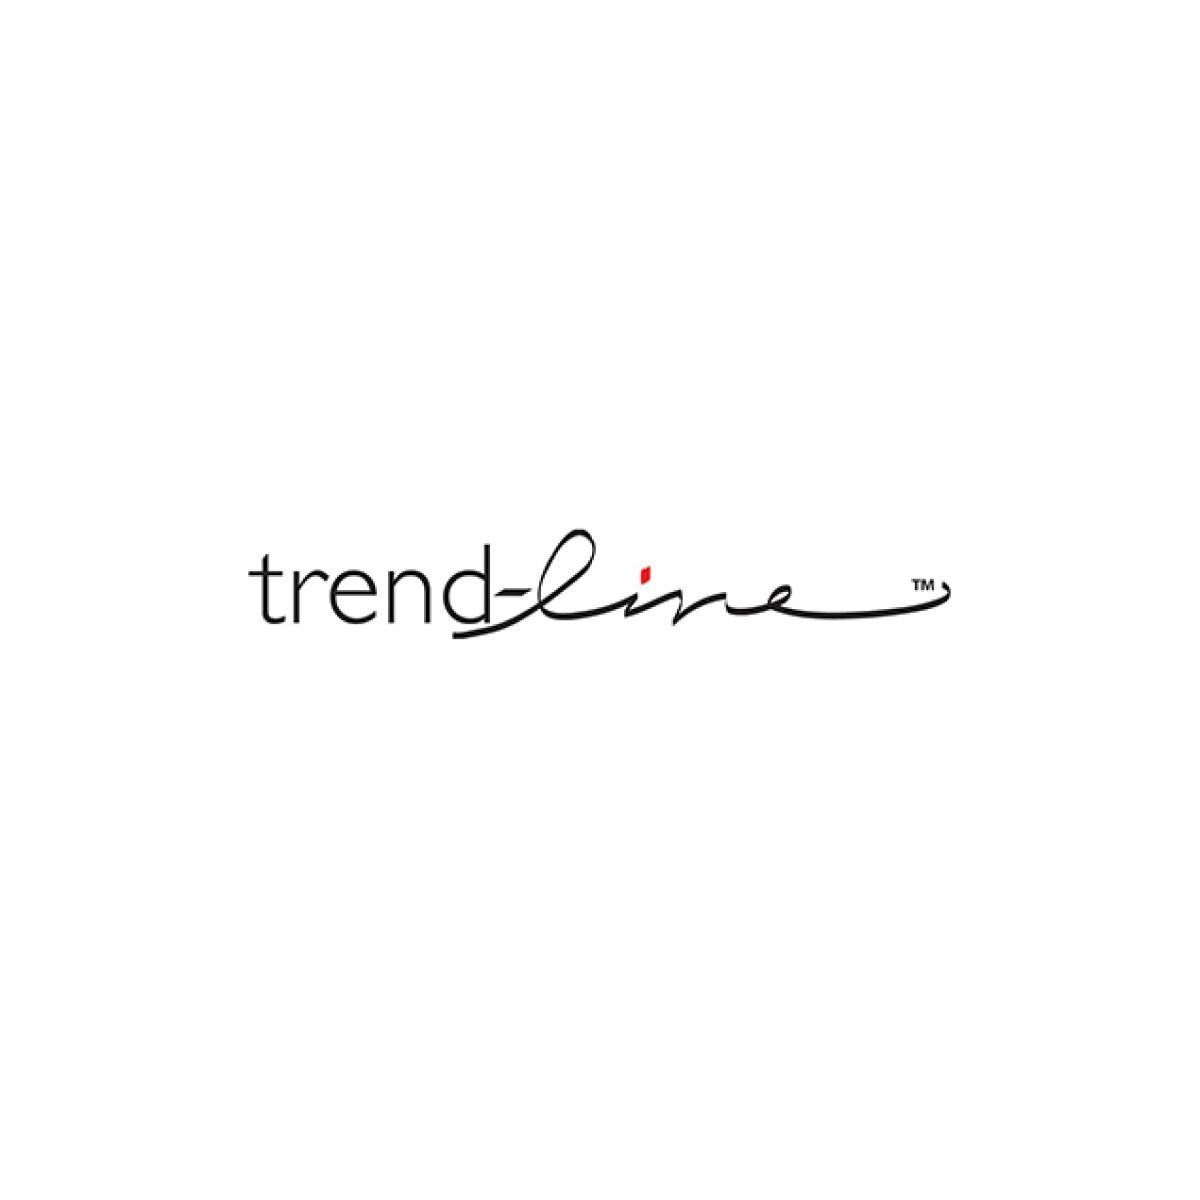 trend_line